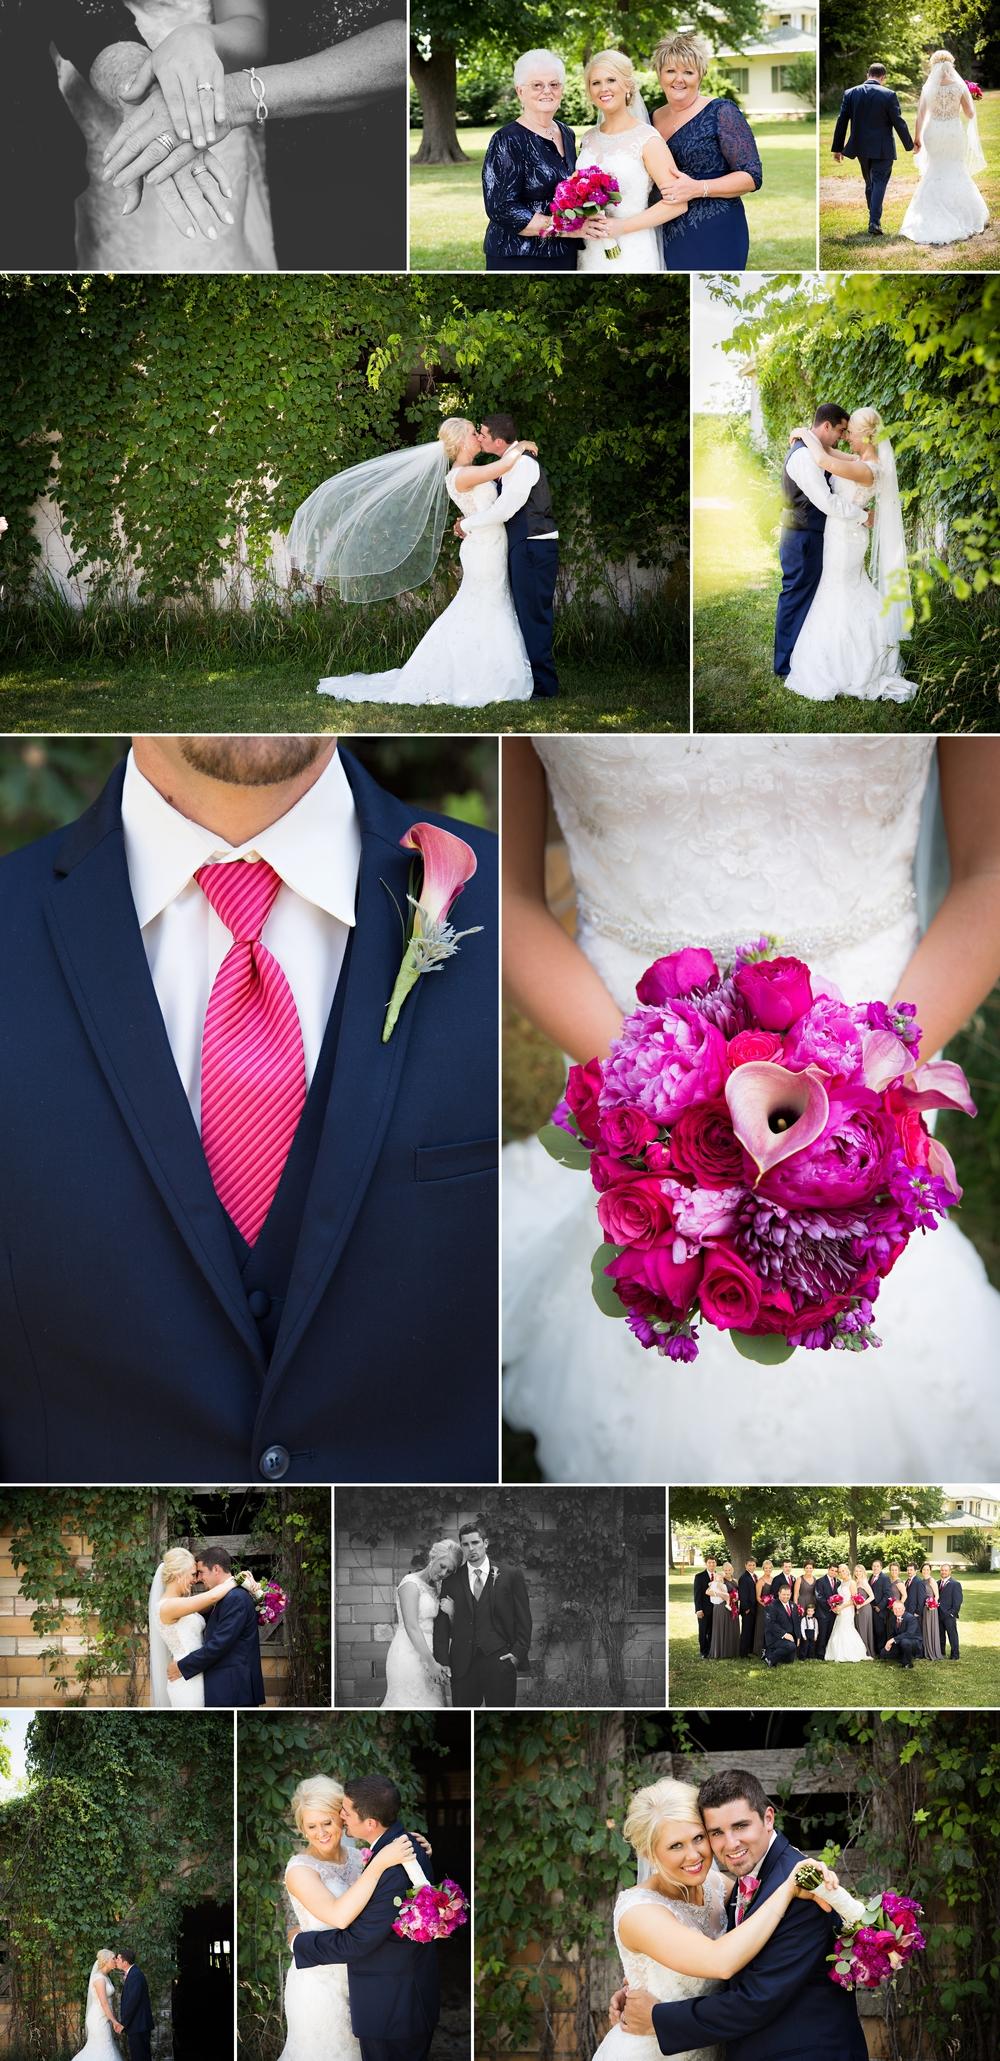 Kuhn wedding 5.jpg